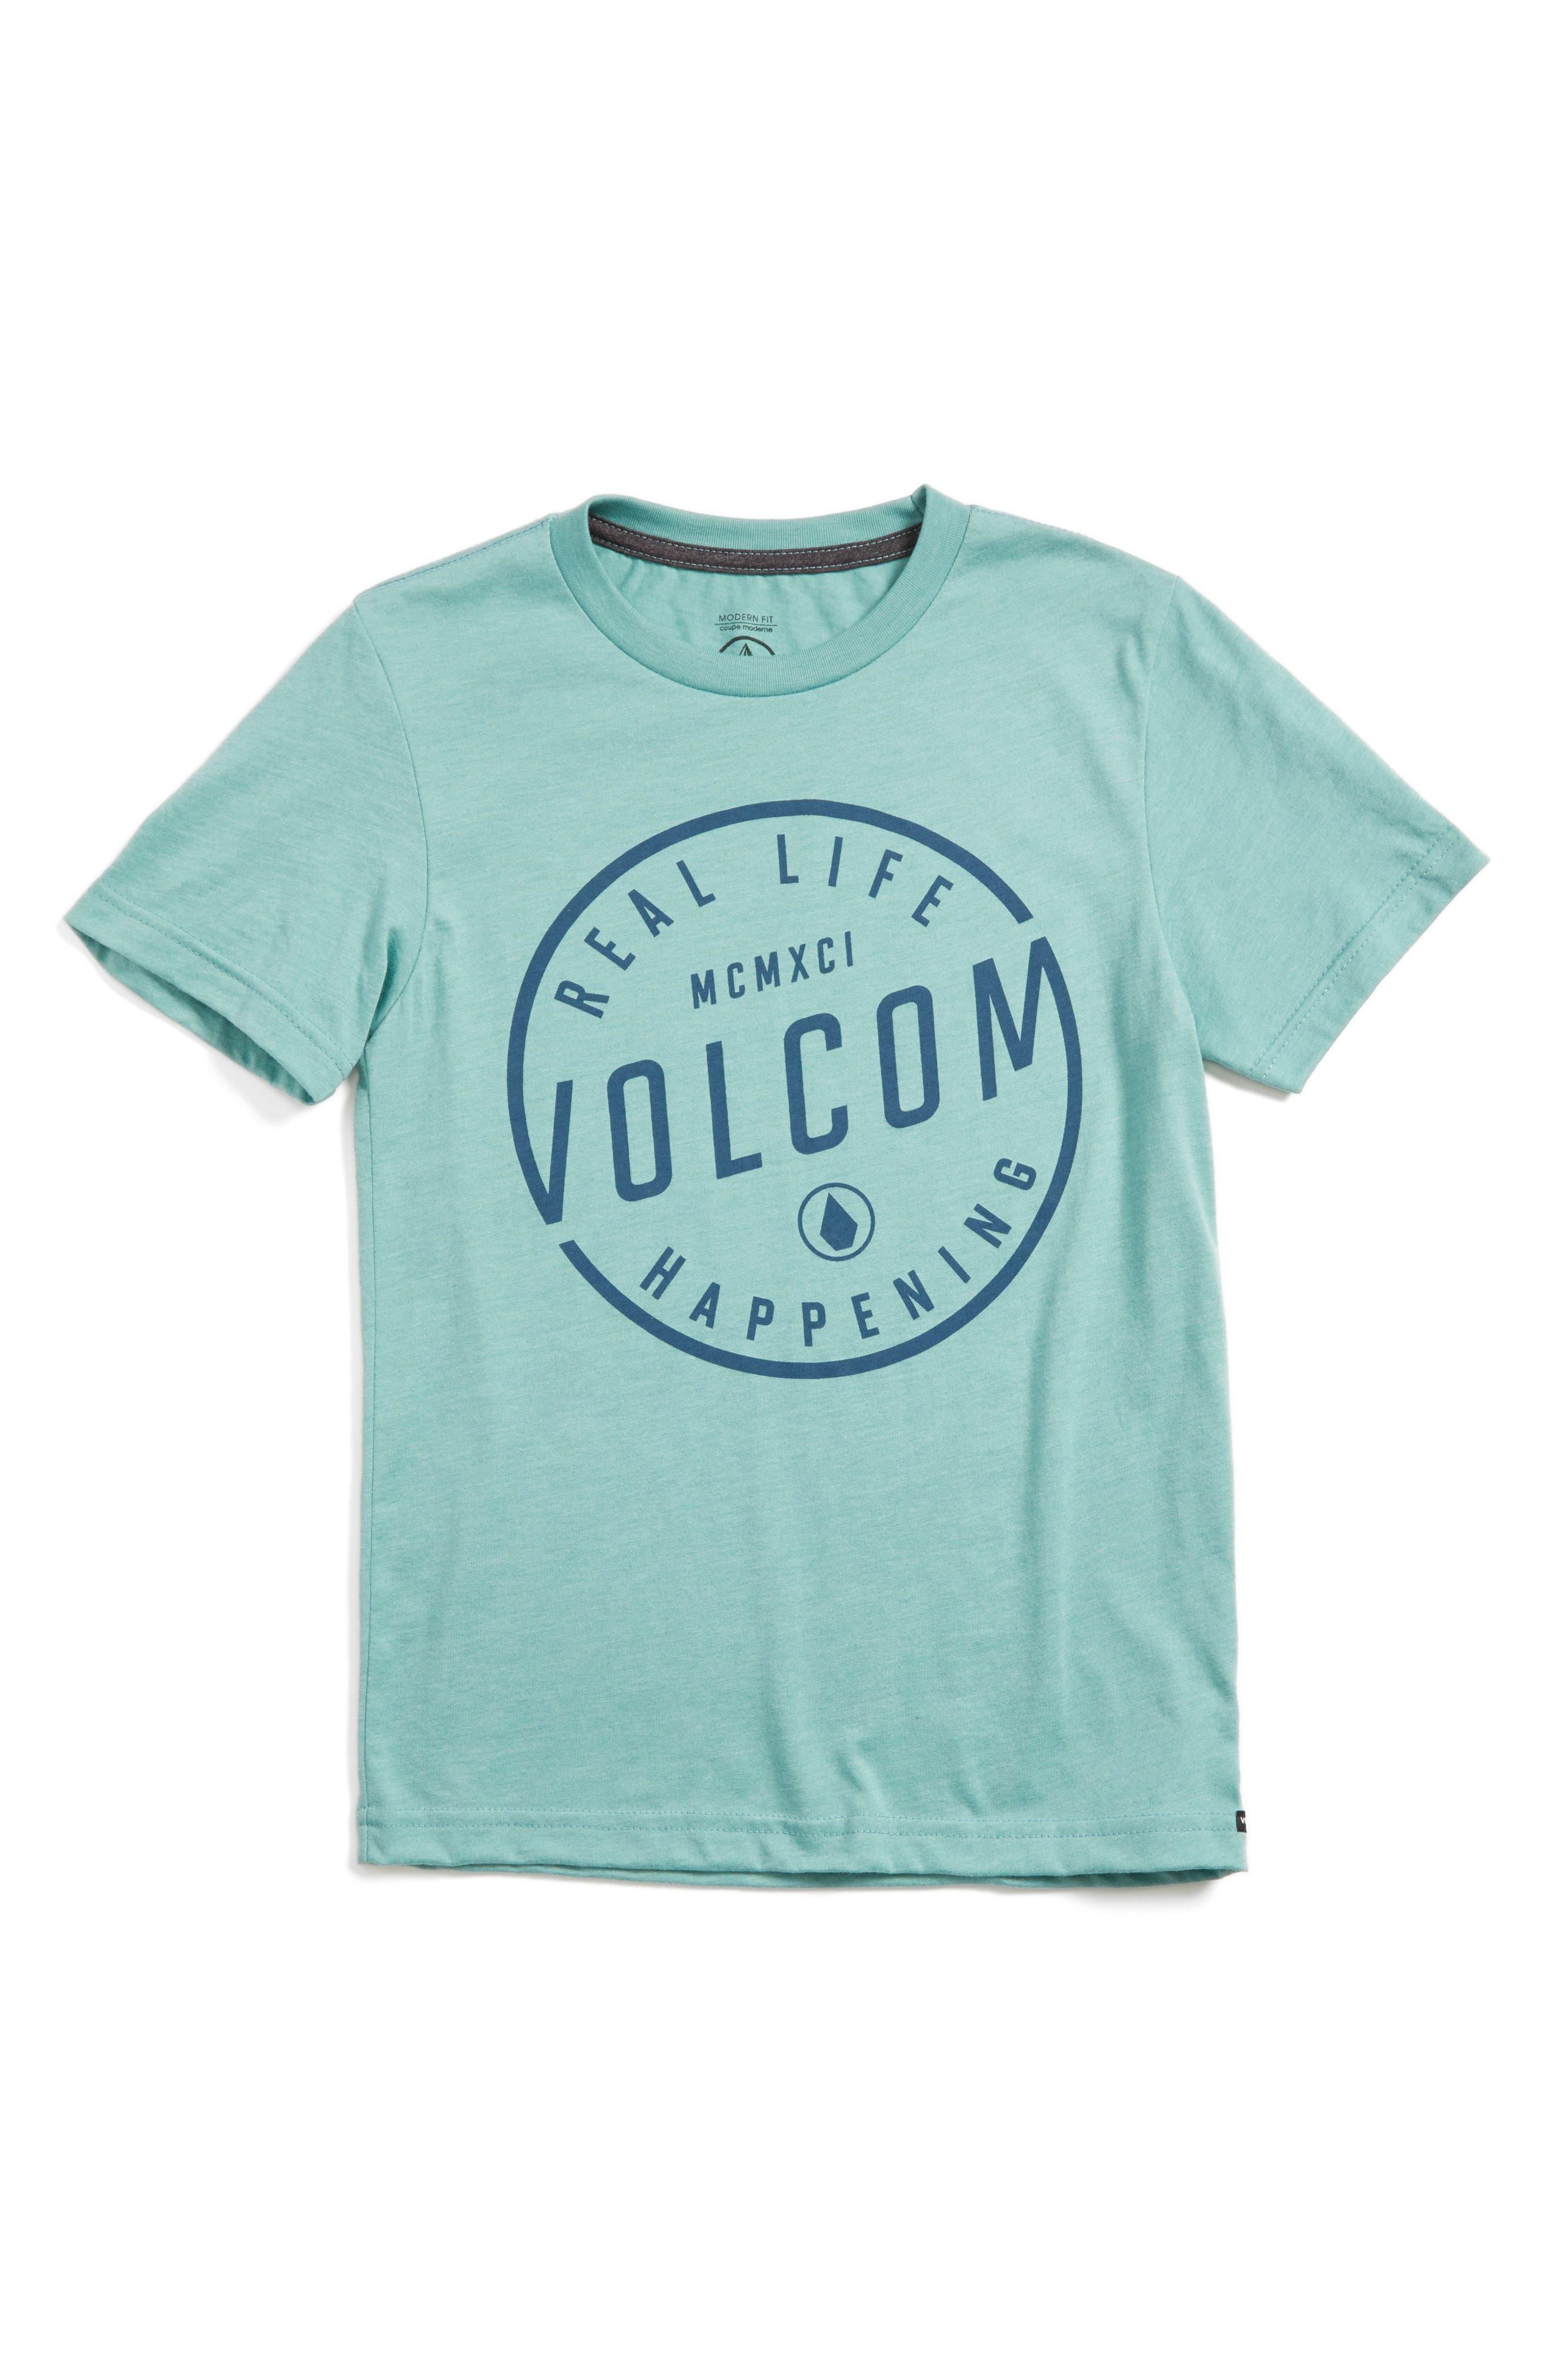 Alternate Image 1 Selected - Volcom On Lock Graphic T-Shirt (Toddler Boys, Little Boys & Big Boys)